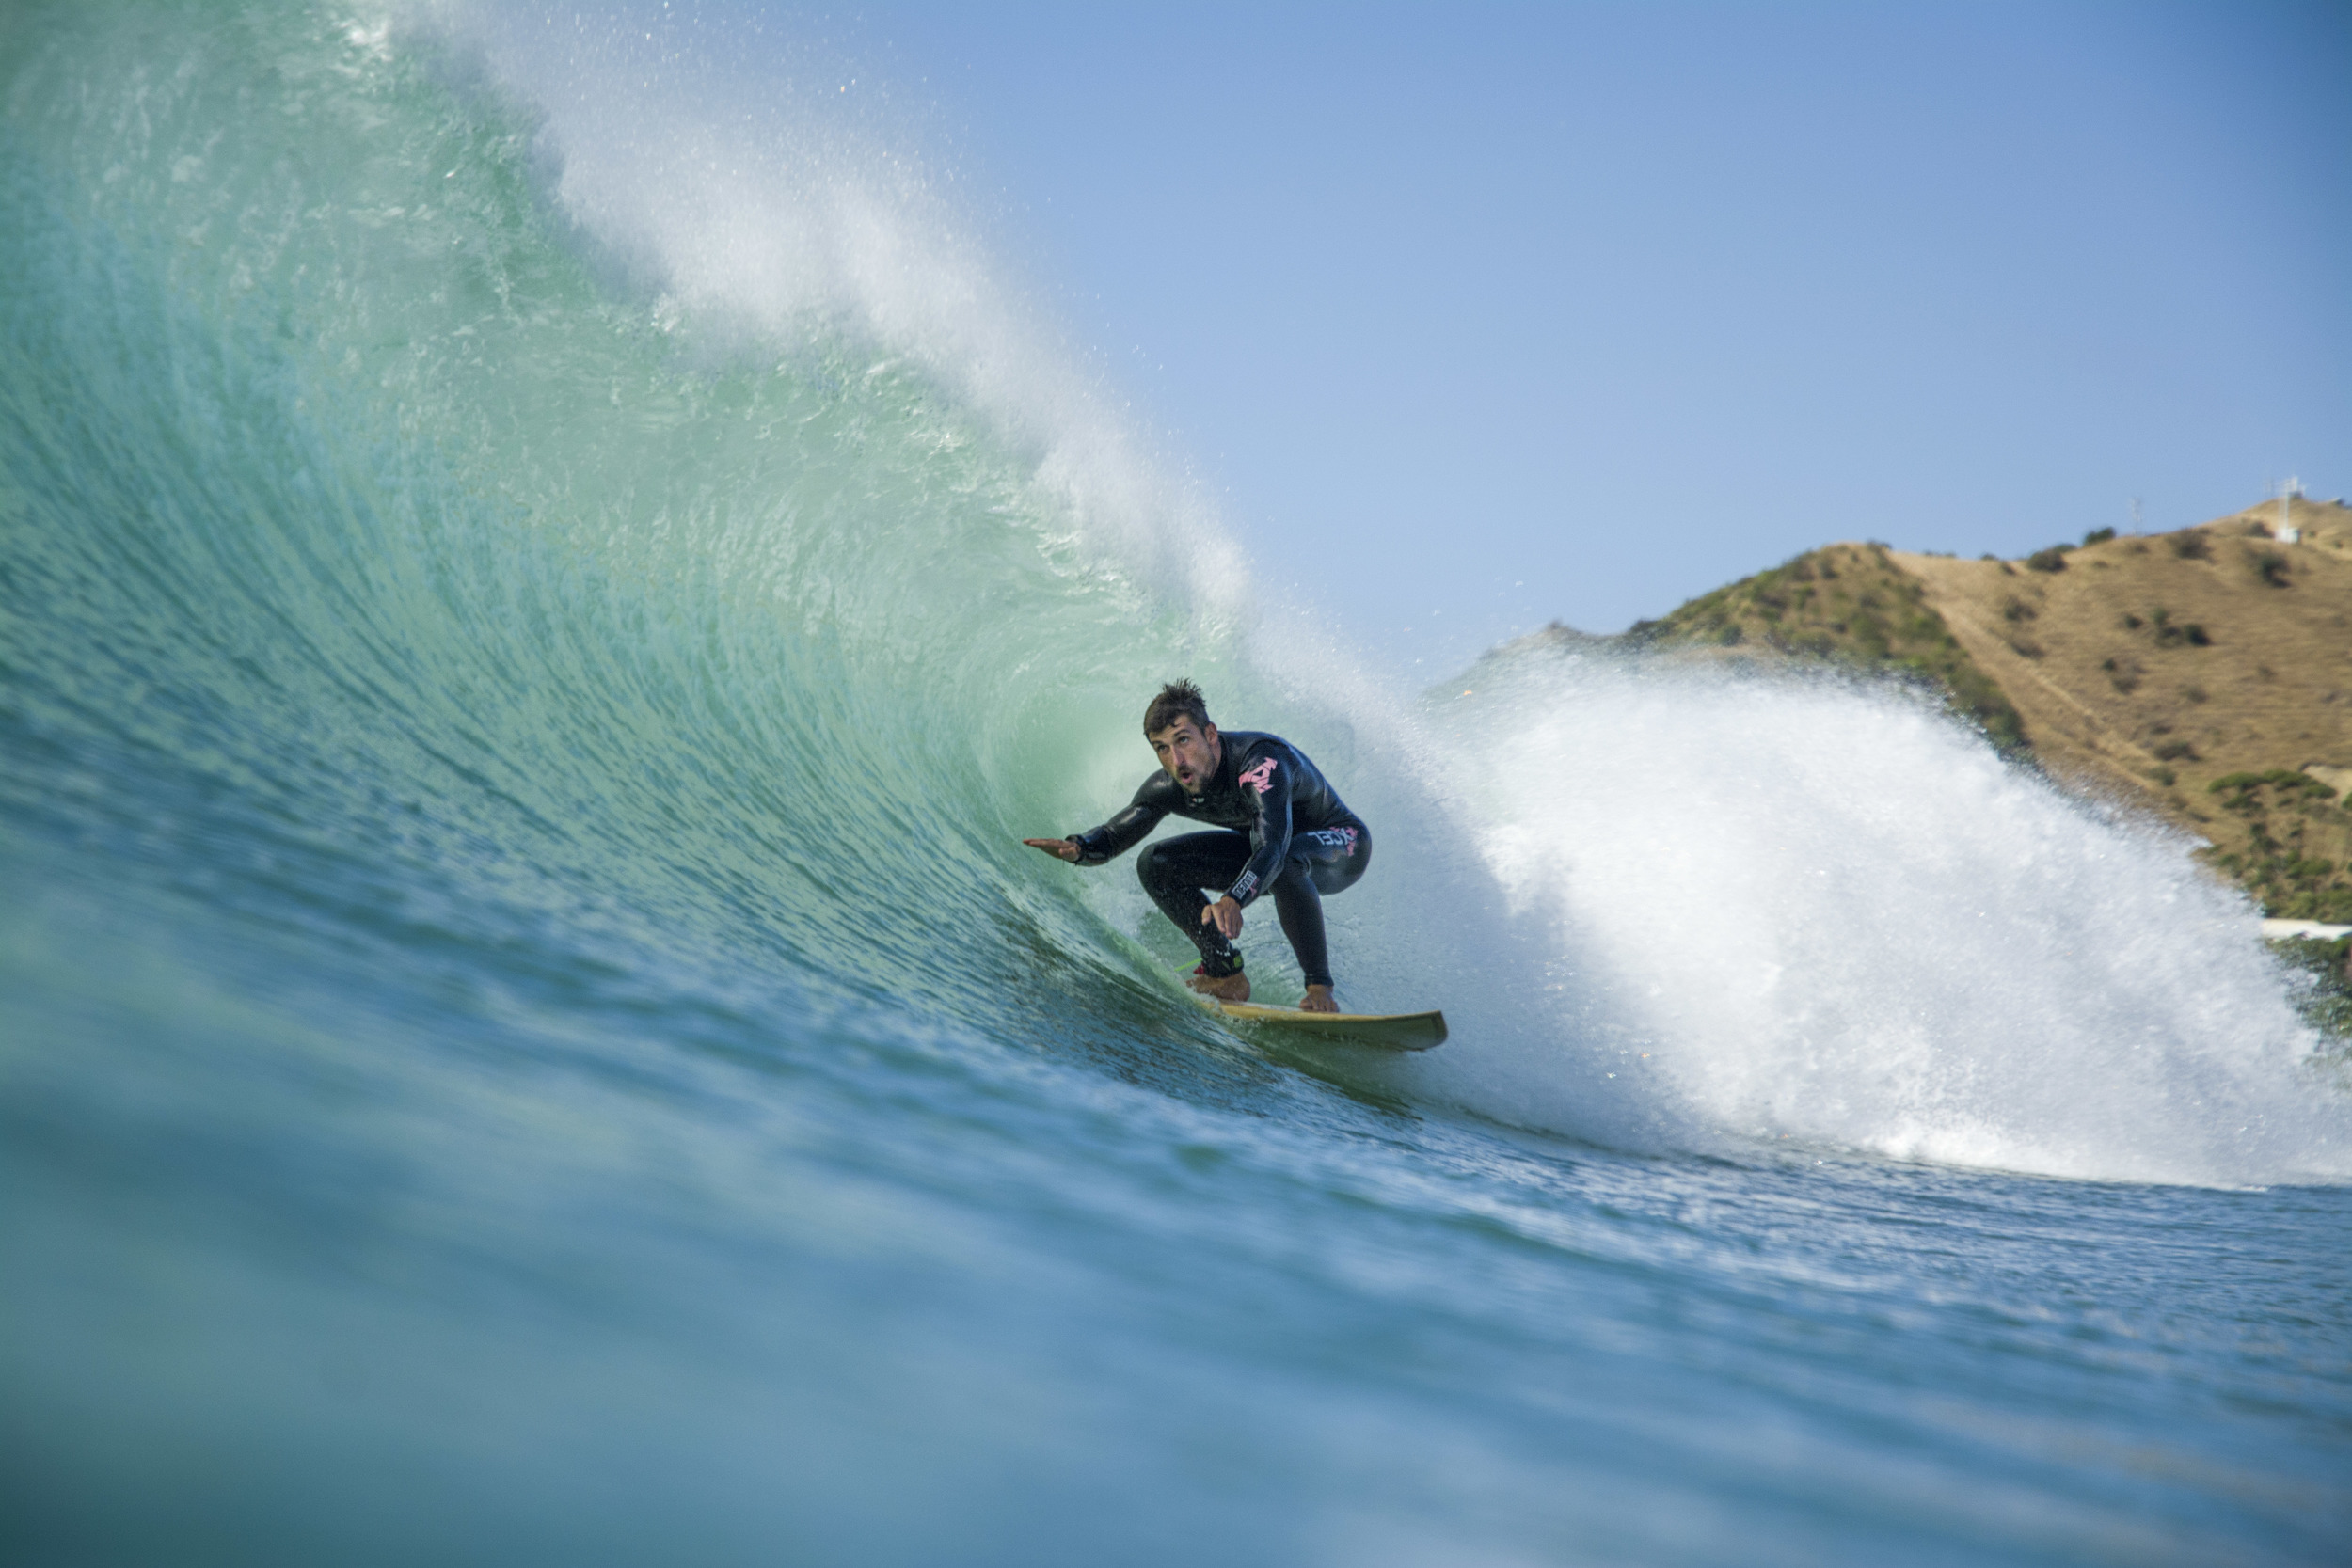 Bonzer wooden surfboard